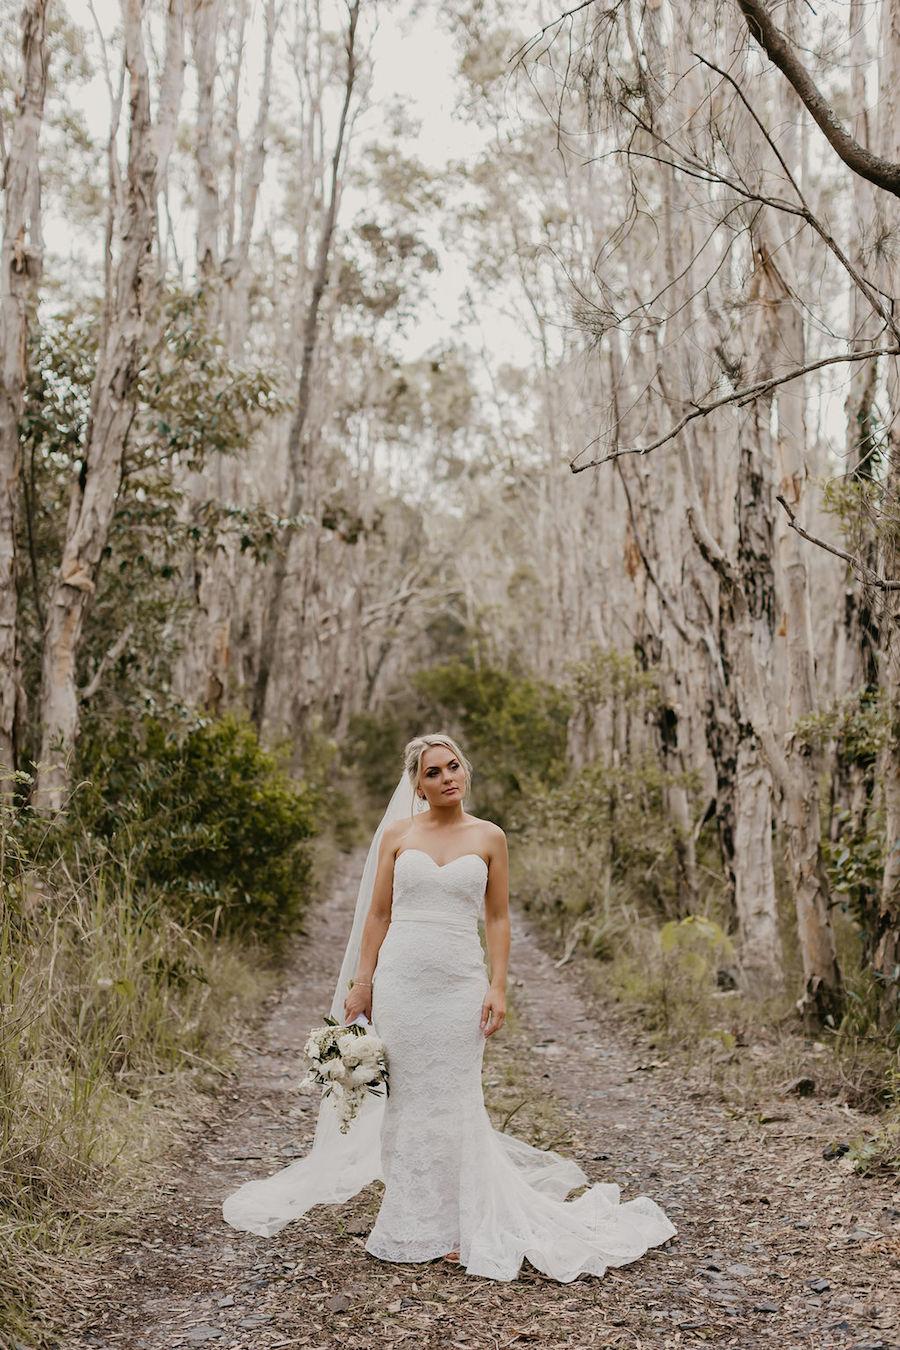 tweed-coast-weddings-wedding-venue-osteria-casuarina-ceremony-reception-5D3A7167.jpg